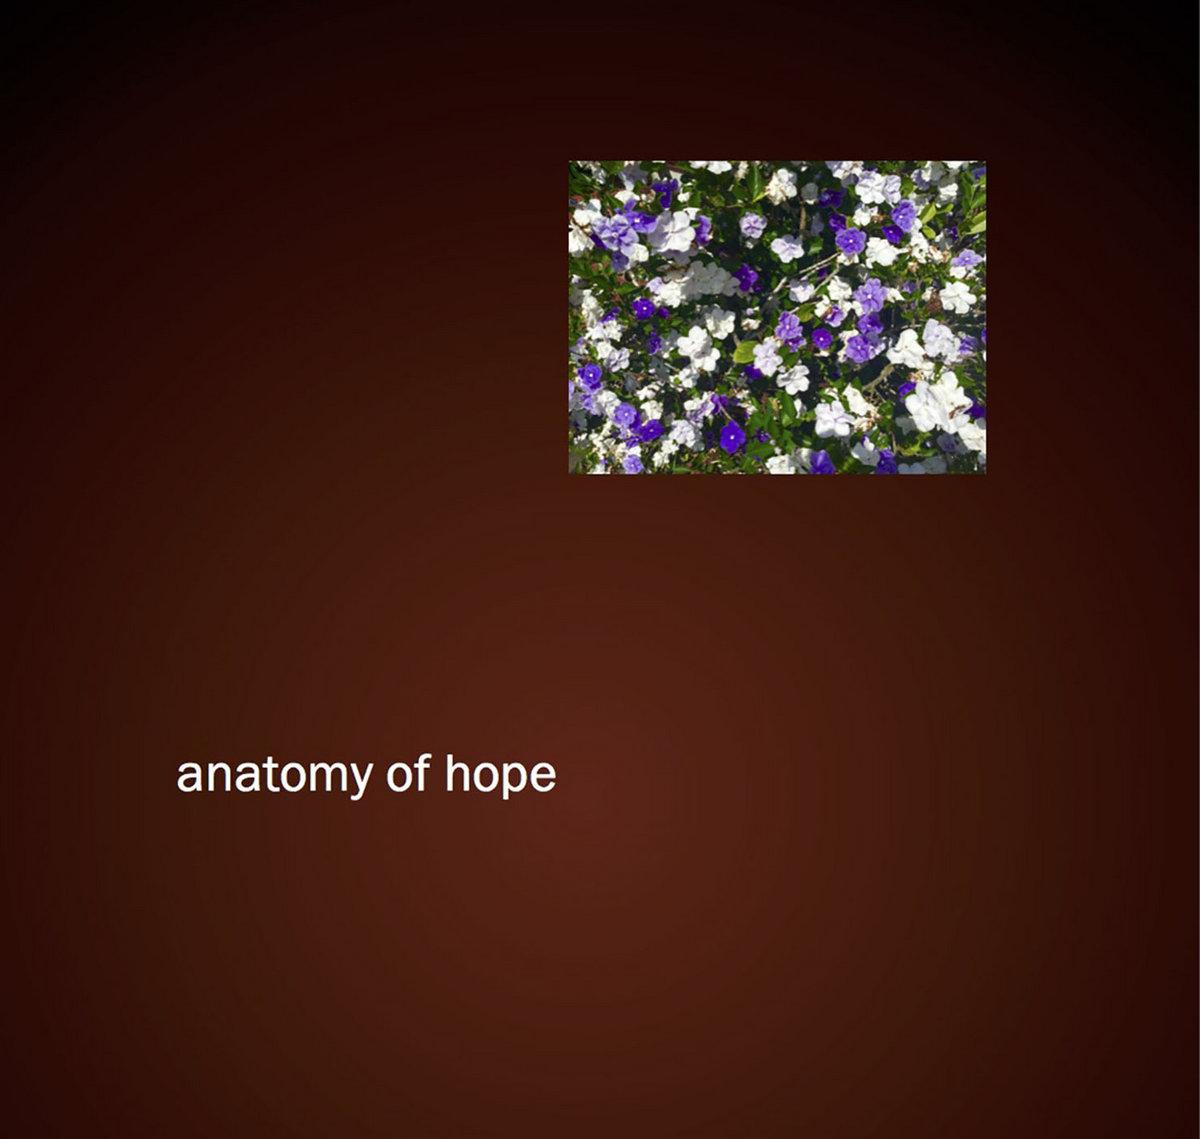 Unplug And Release Anatomy Of Hope